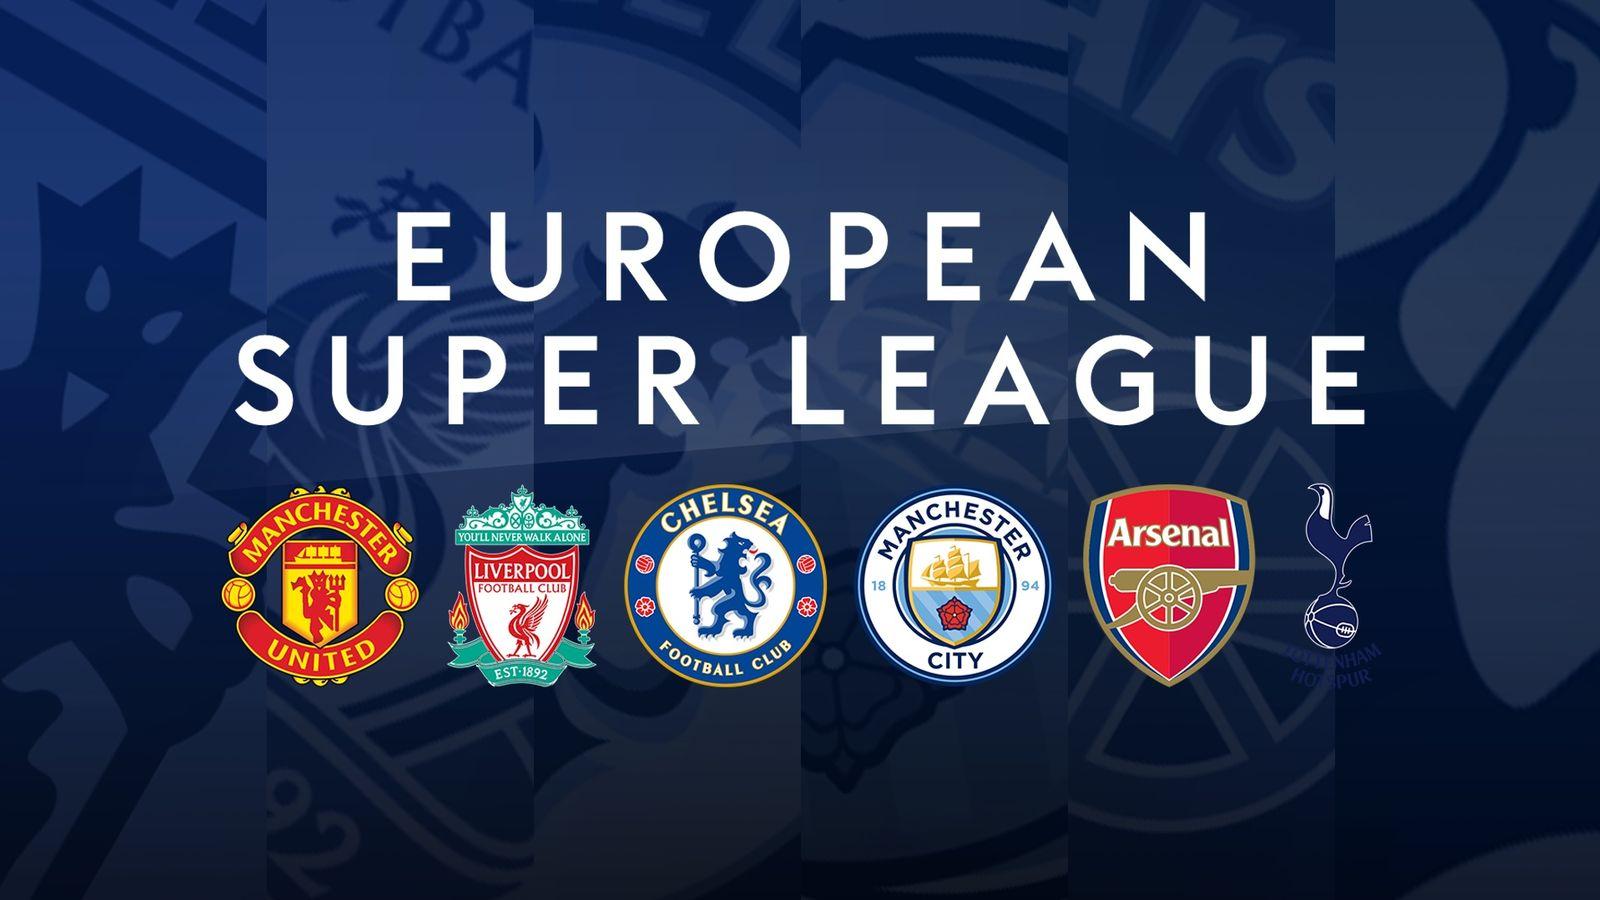 European Super League4